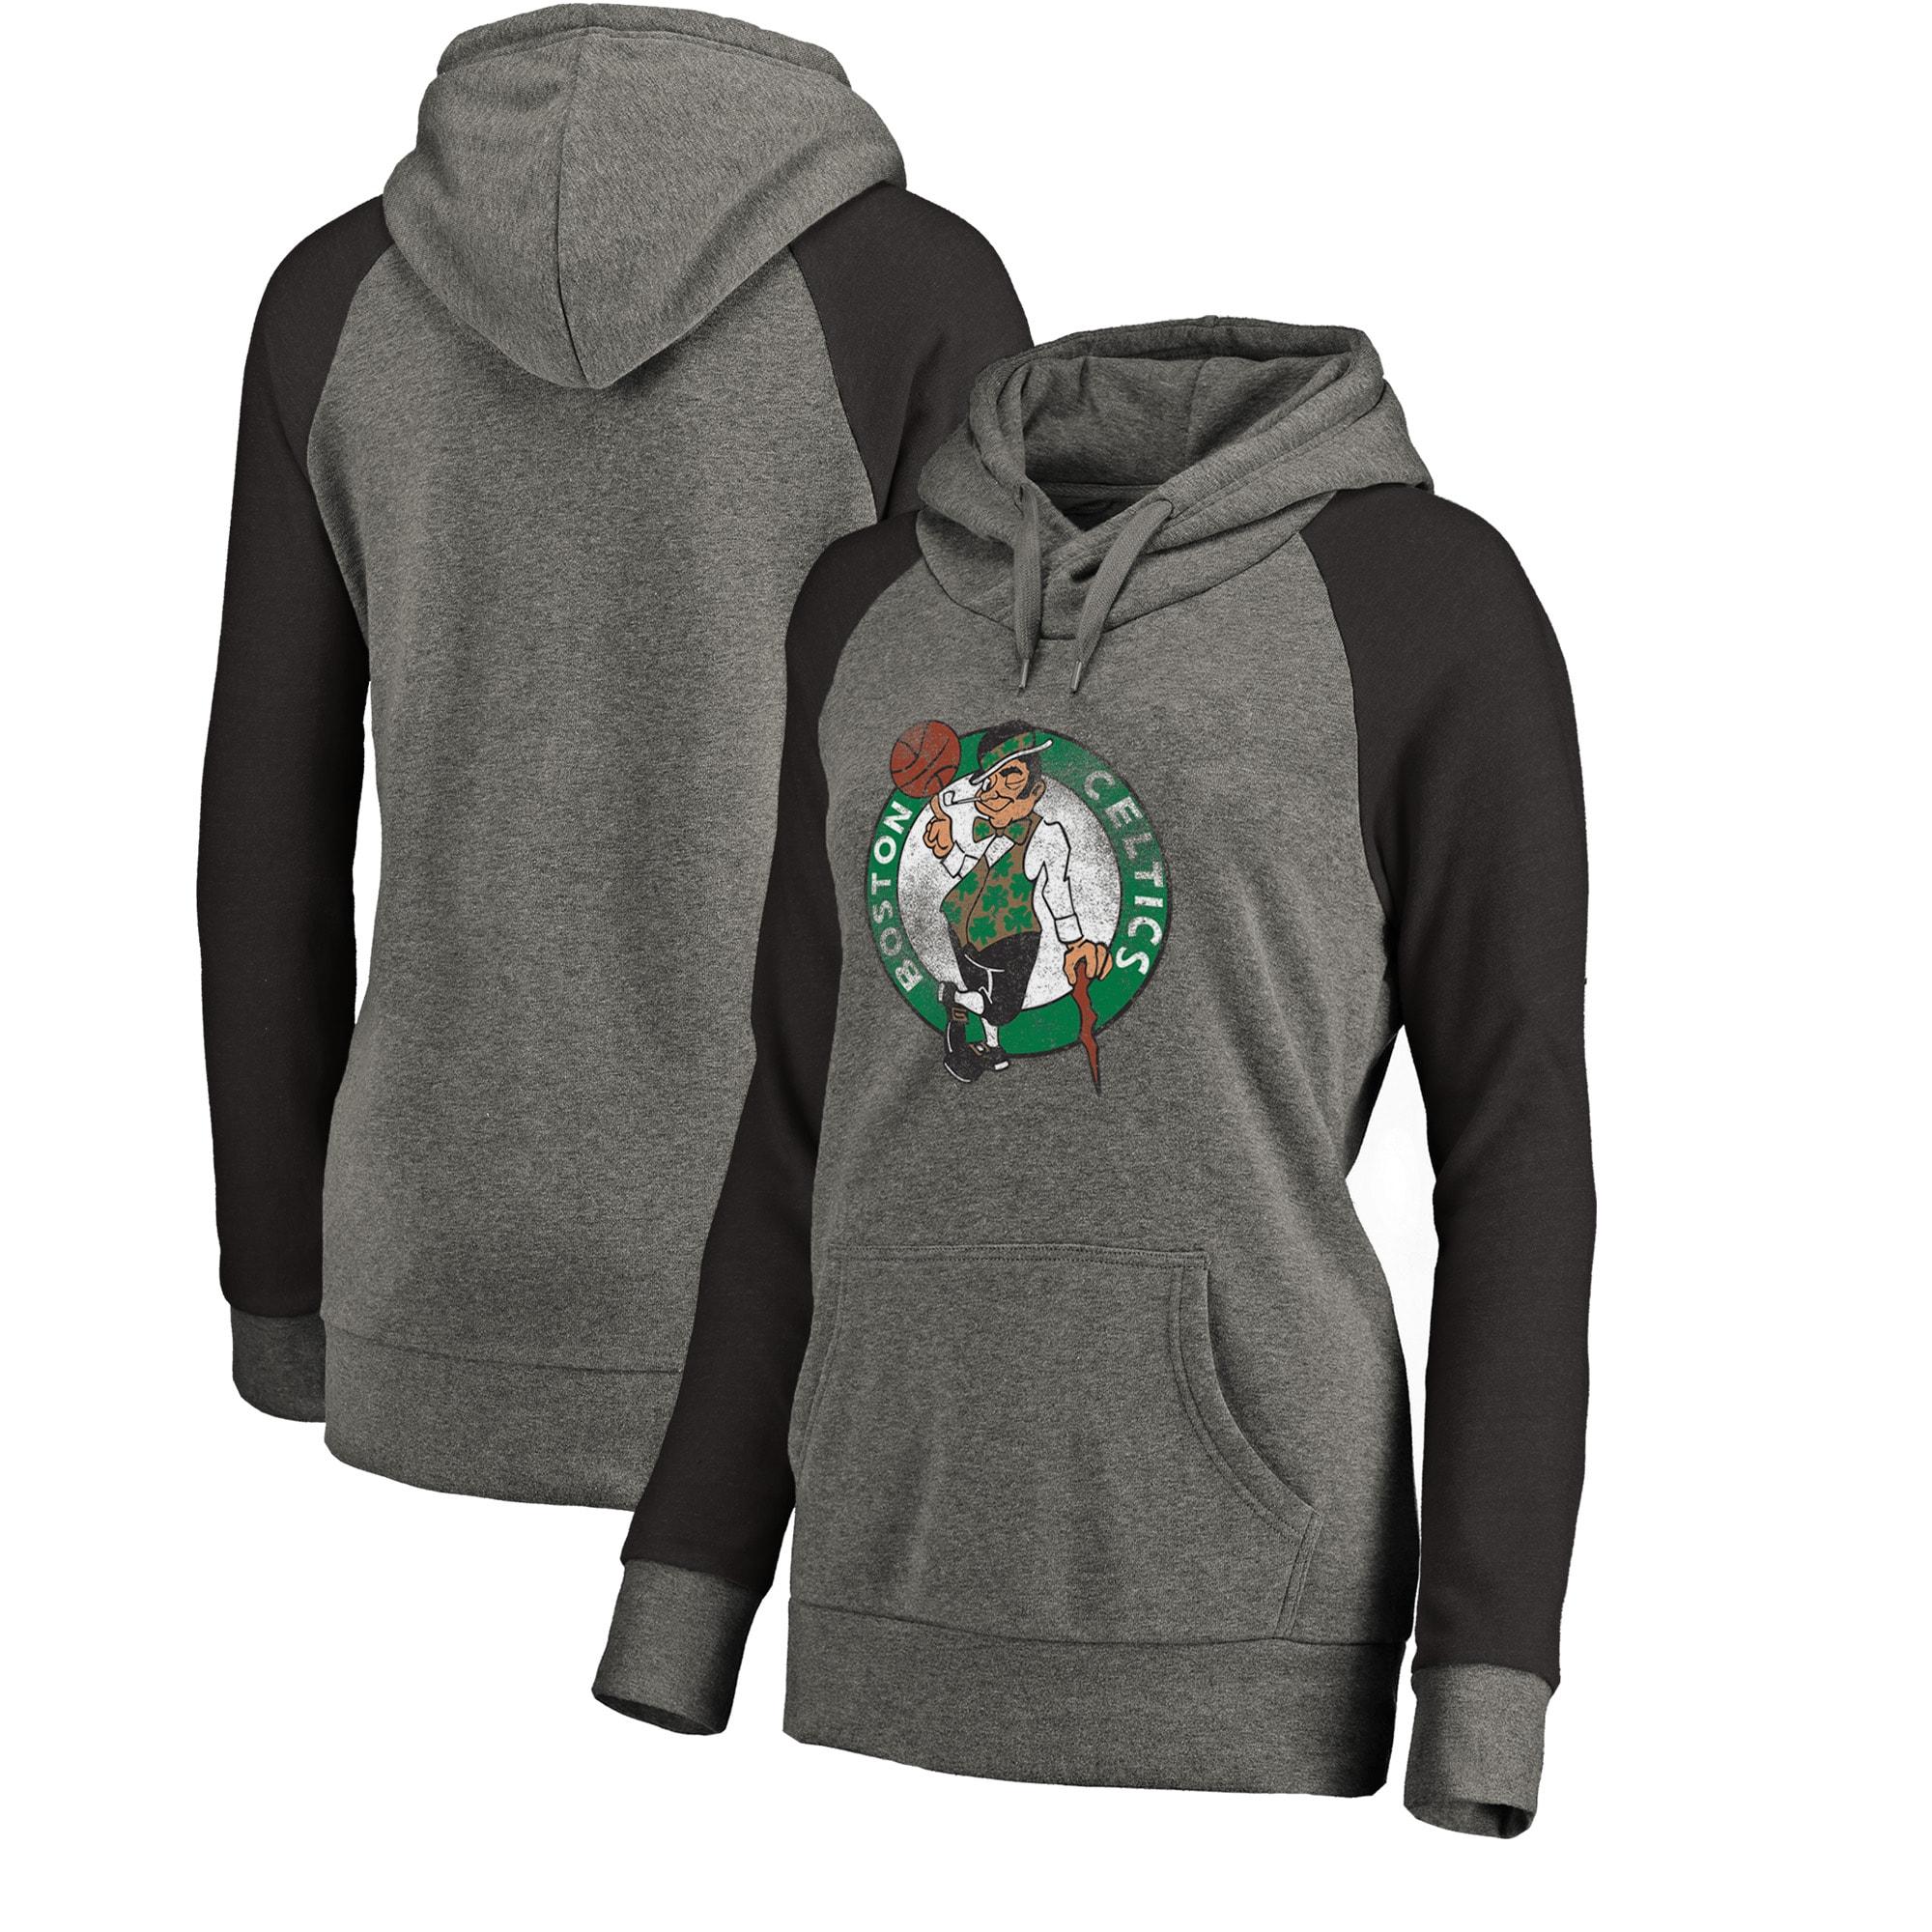 Boston Celtics Fanatics Branded Women's Distressed Logo Tri-Blend Pullover Hoodie - Ash/Black